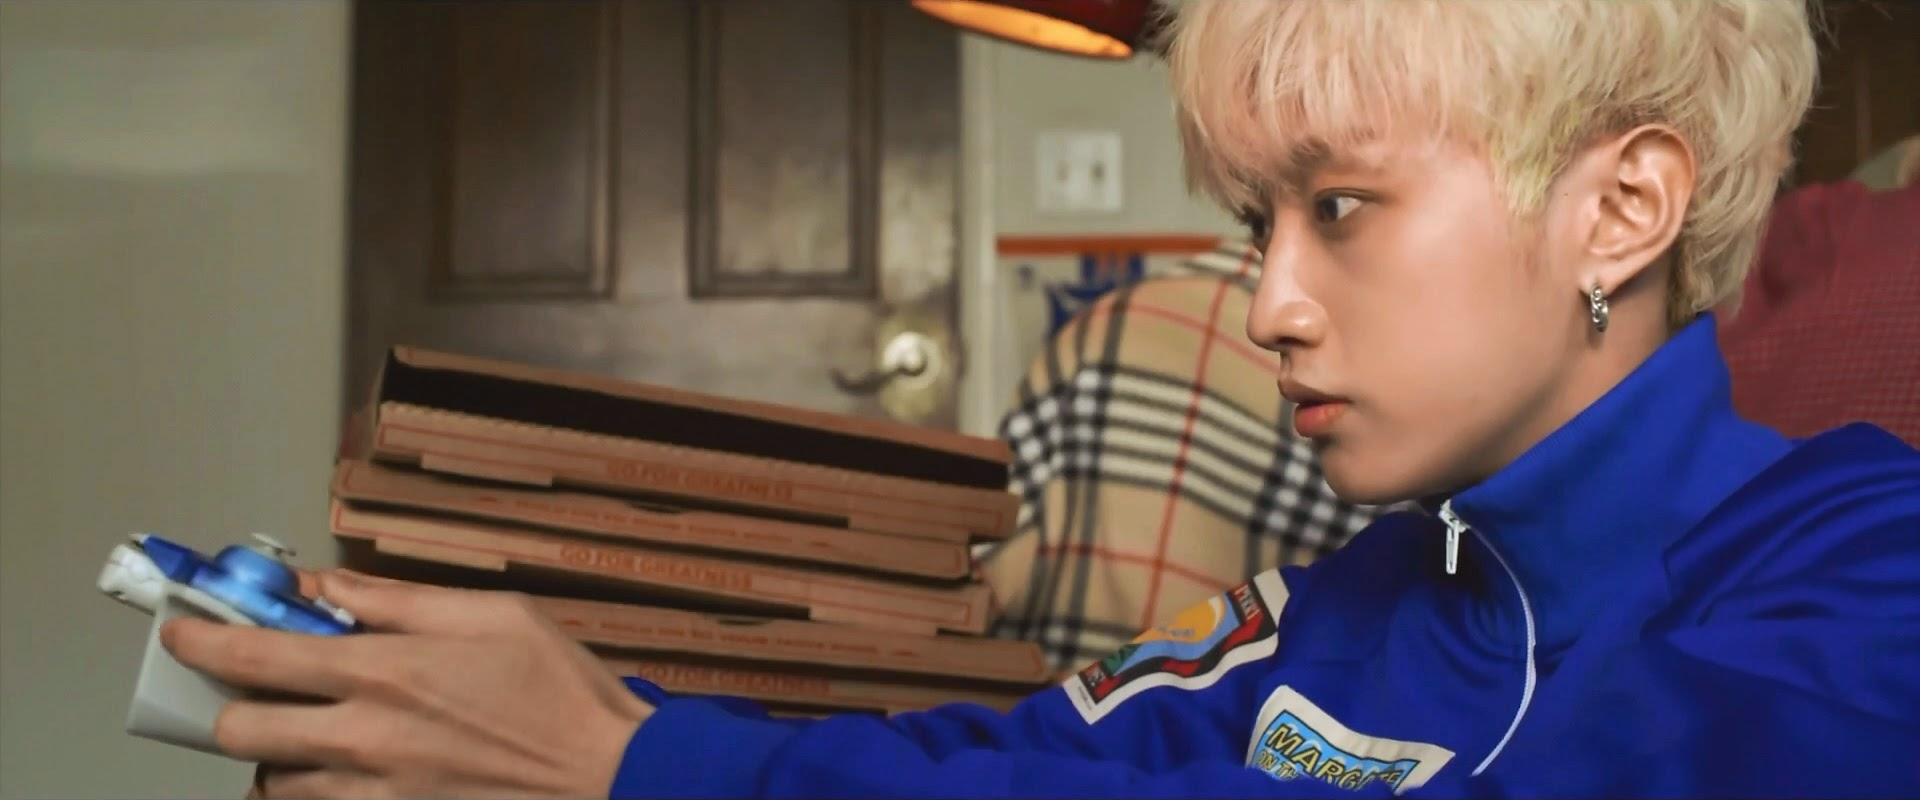 B1a4 Jinyoung Solo Day B1a4  B1a4 Jinyoung Solo Day